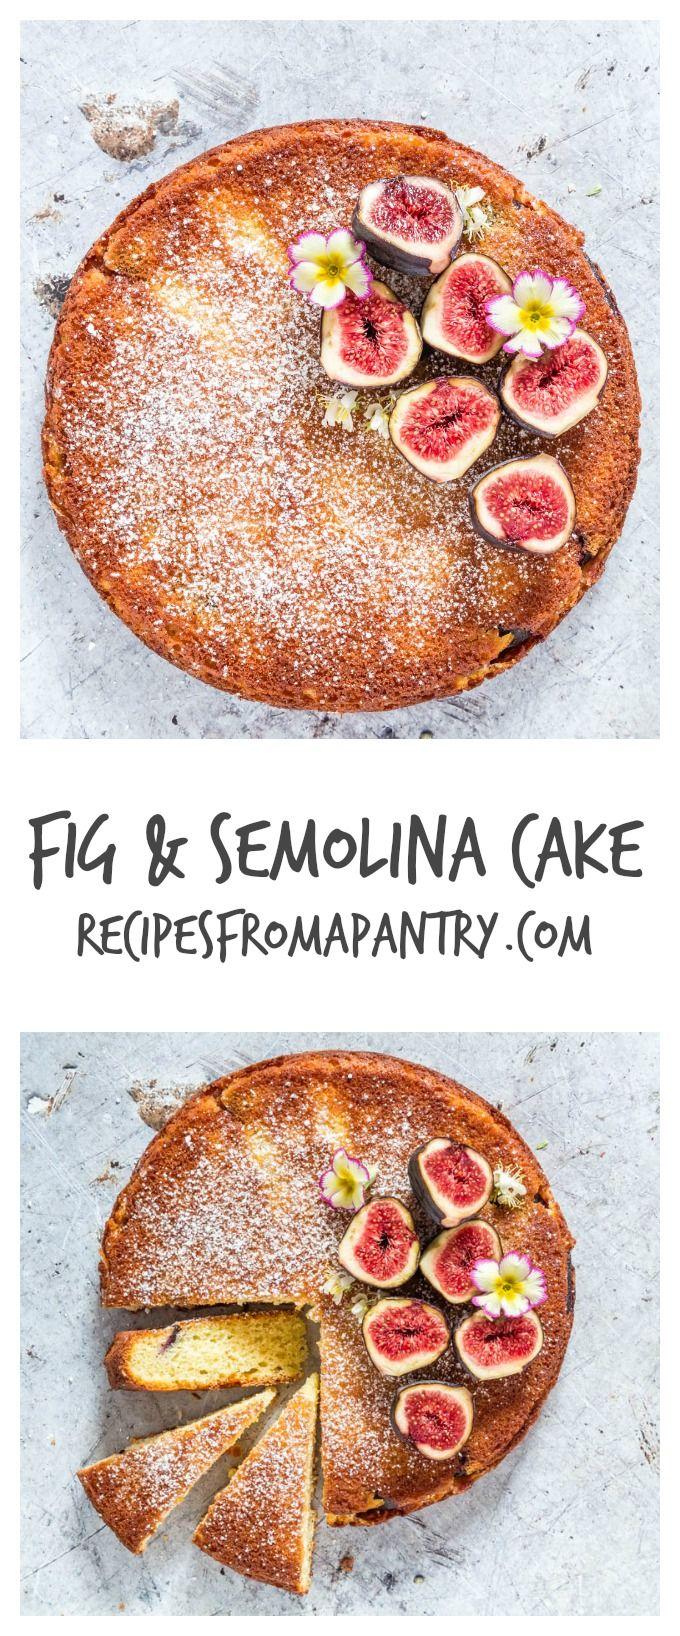 Fig And Semolina Cake - This gorgeous Greek yoghurt, fig and semolina cake recipe has a simple and stunning presentation. | recipesfromapantry.com